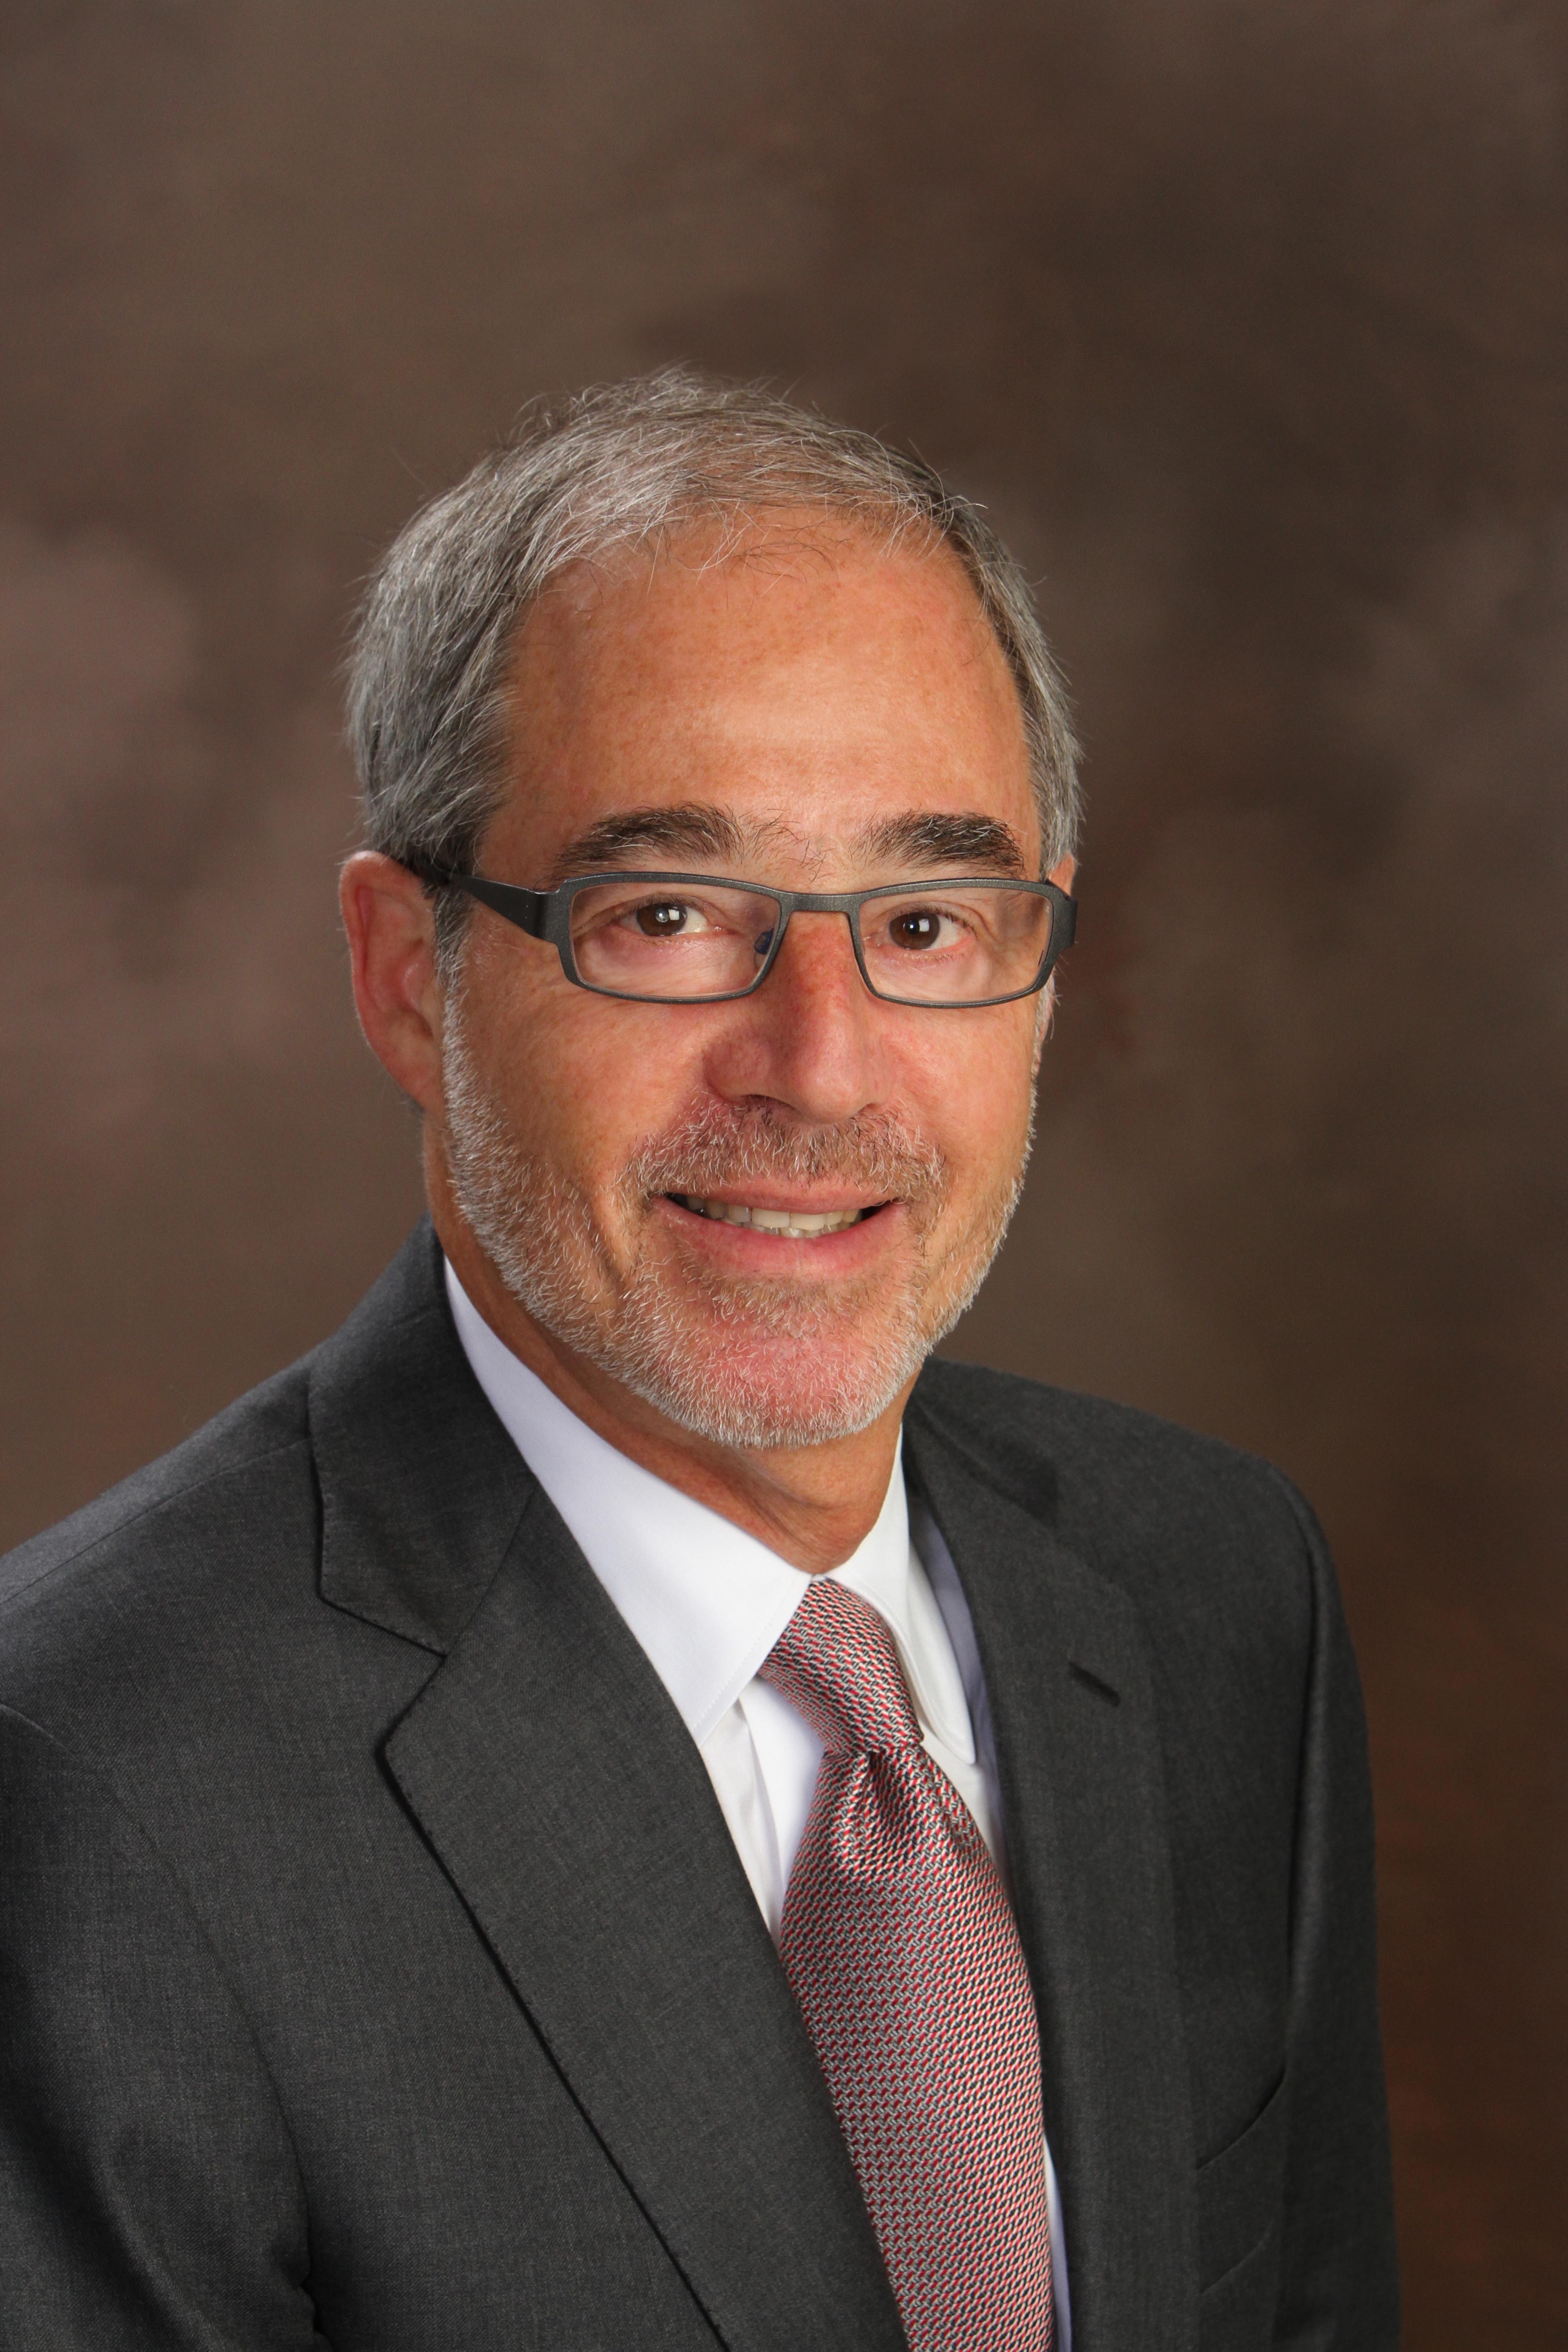 Brian J. Marks